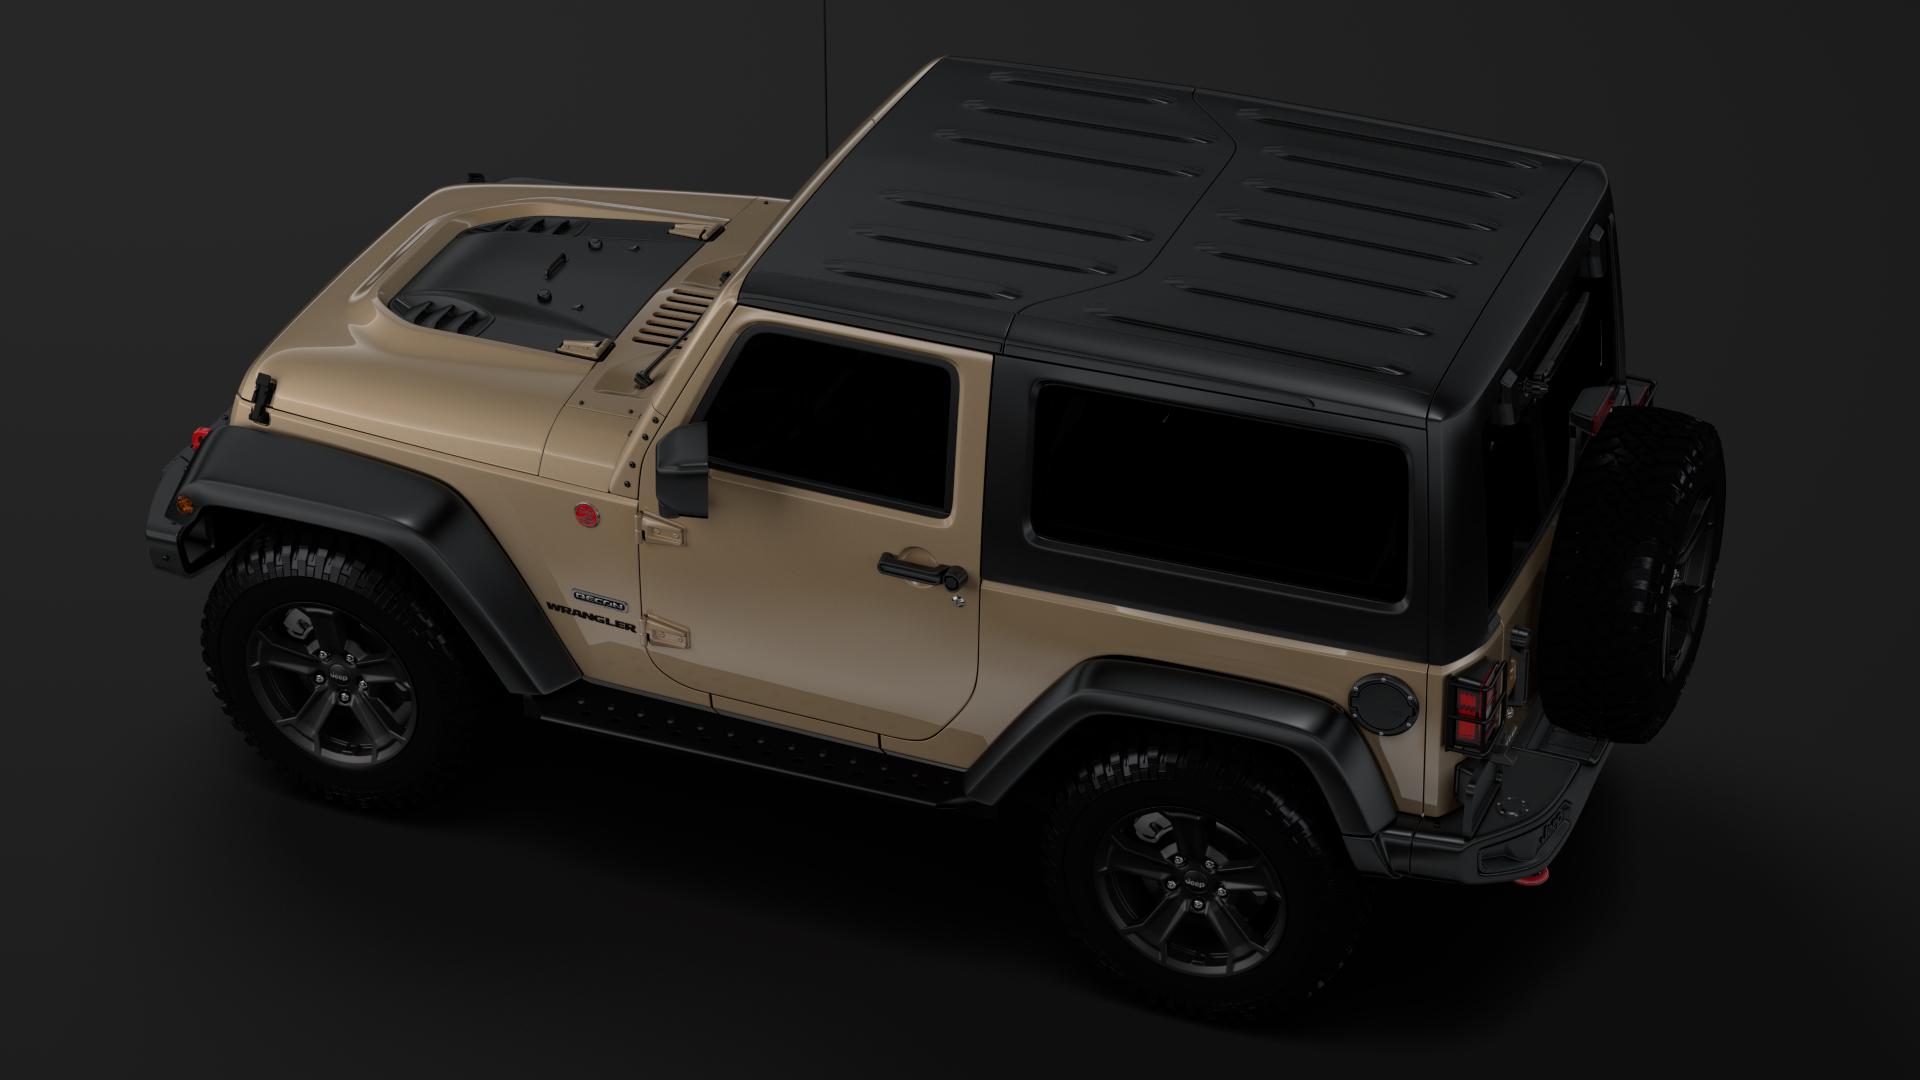 jeep wrangler rubicon recon jk 2017 3d model max fbx lwo ma mb hrc xsi obj 276951